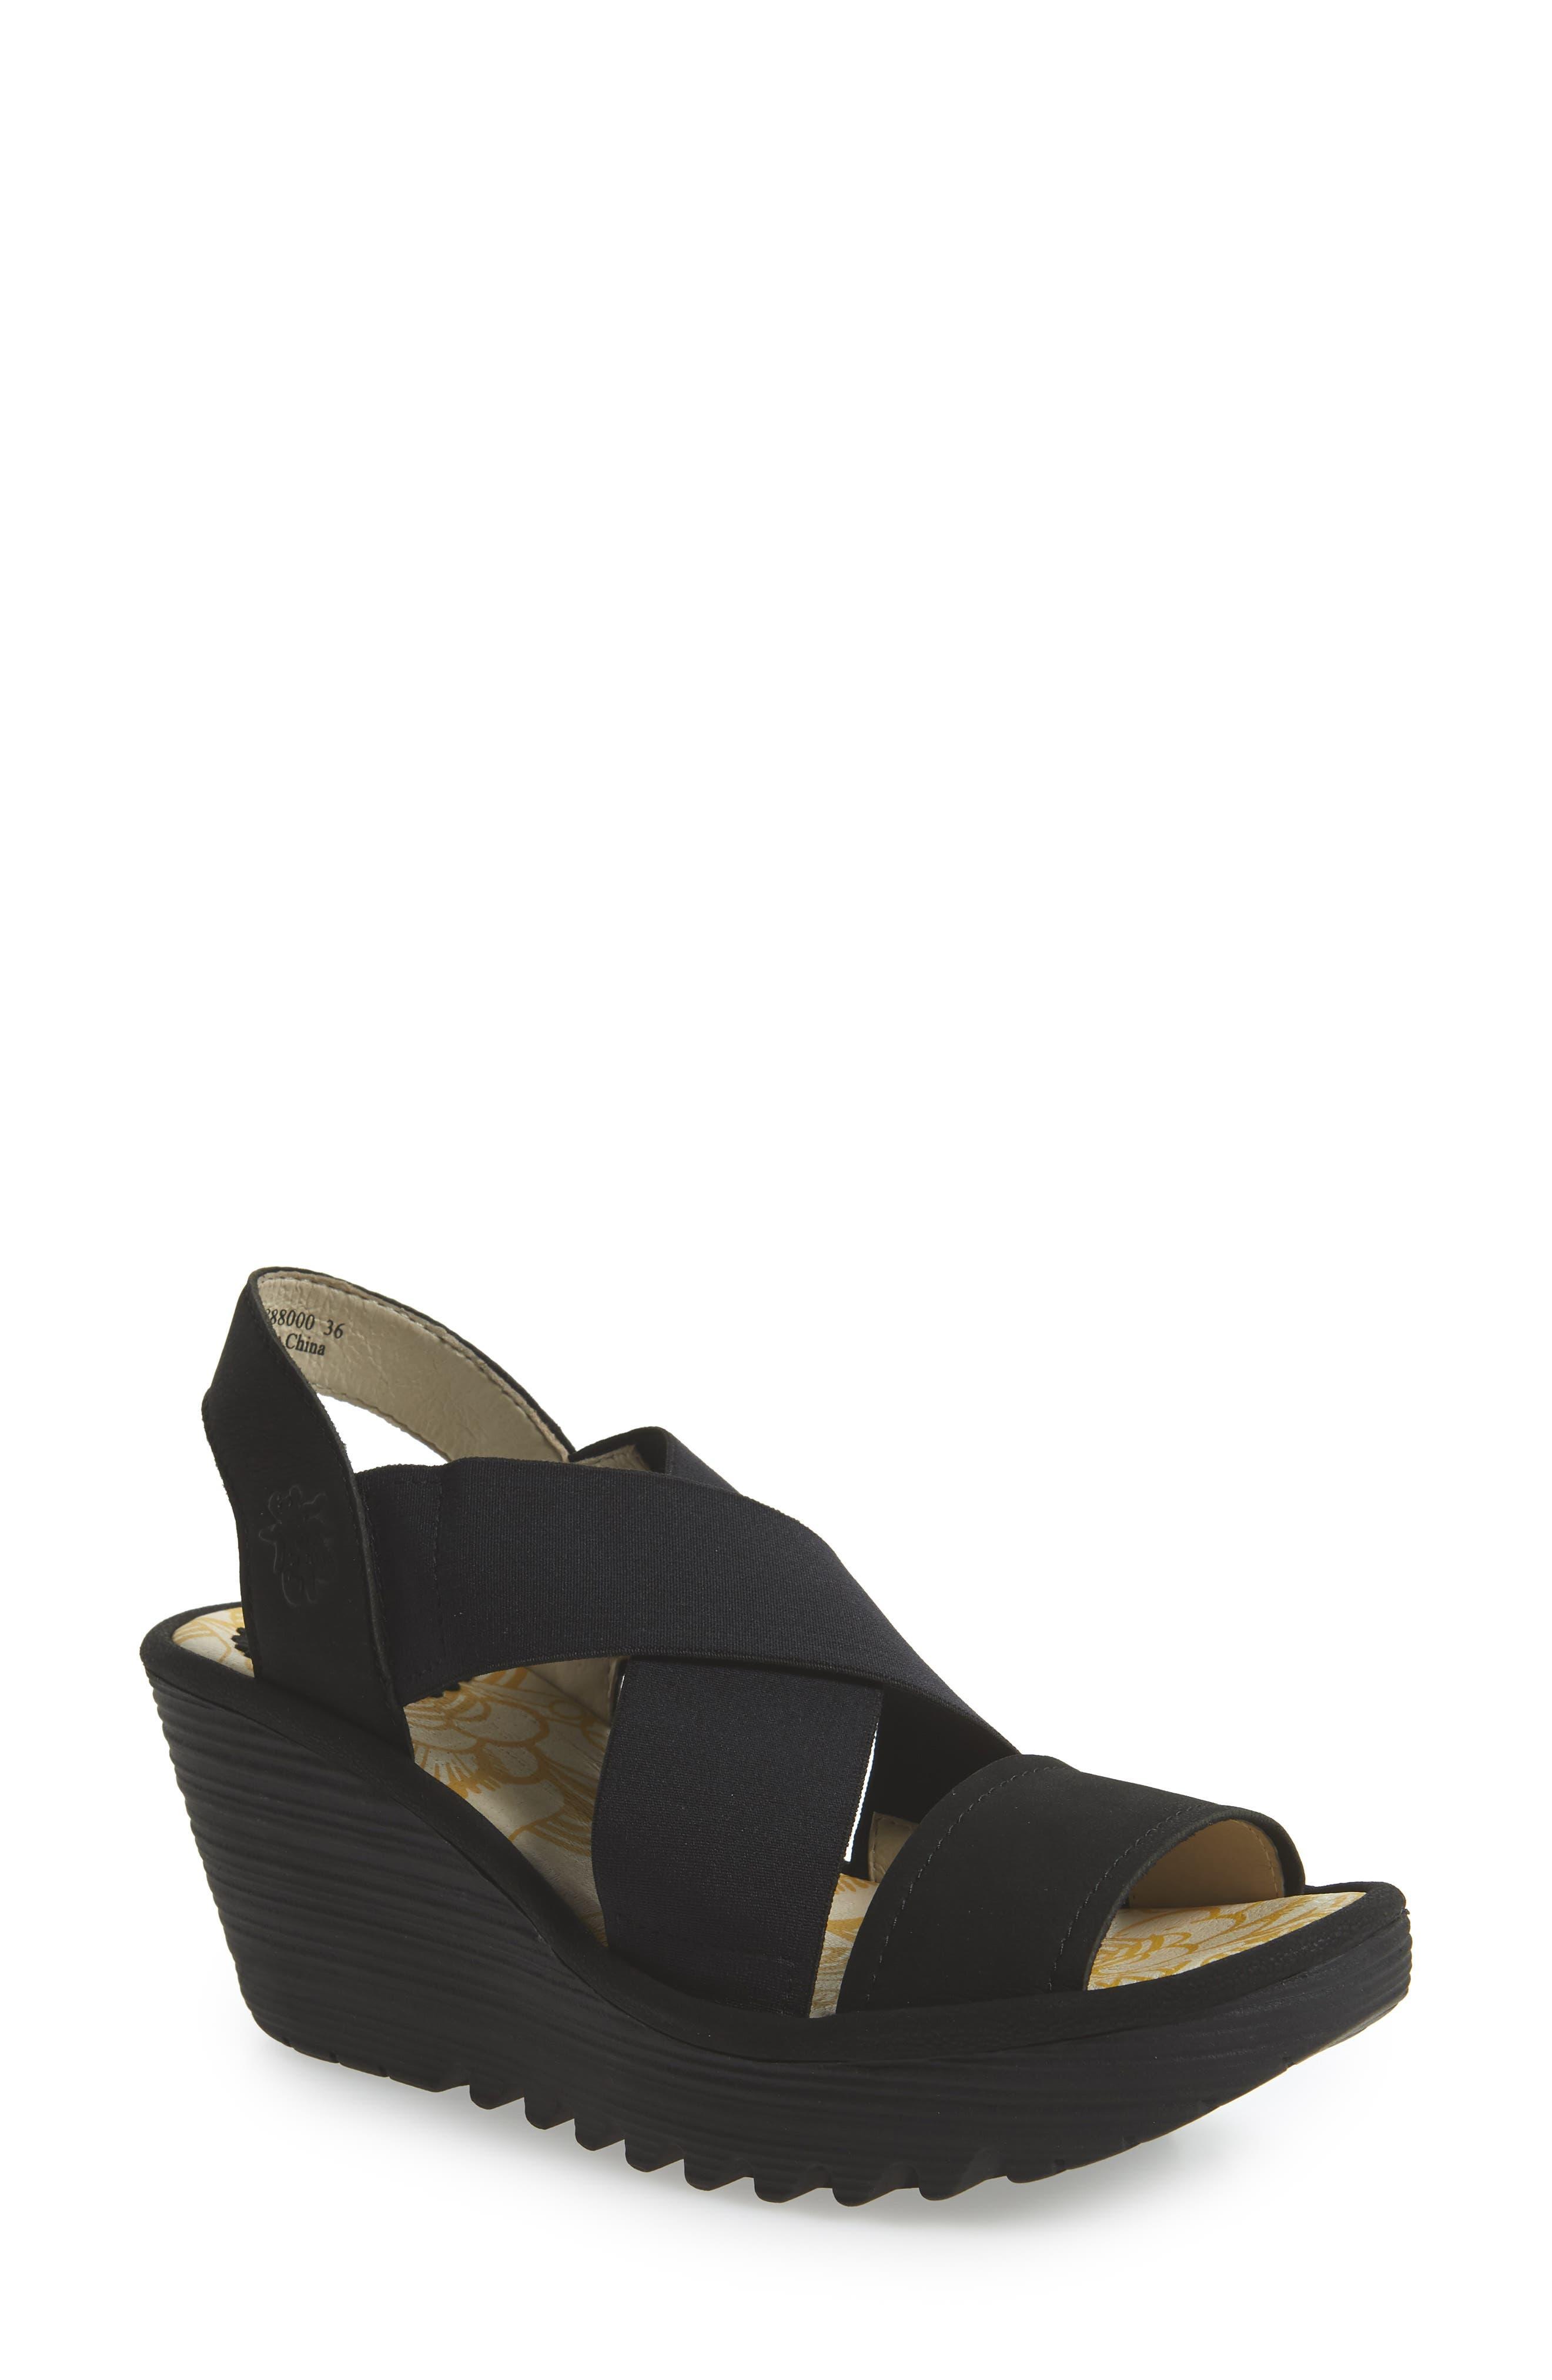 Yaji Cross Wedge Sandal